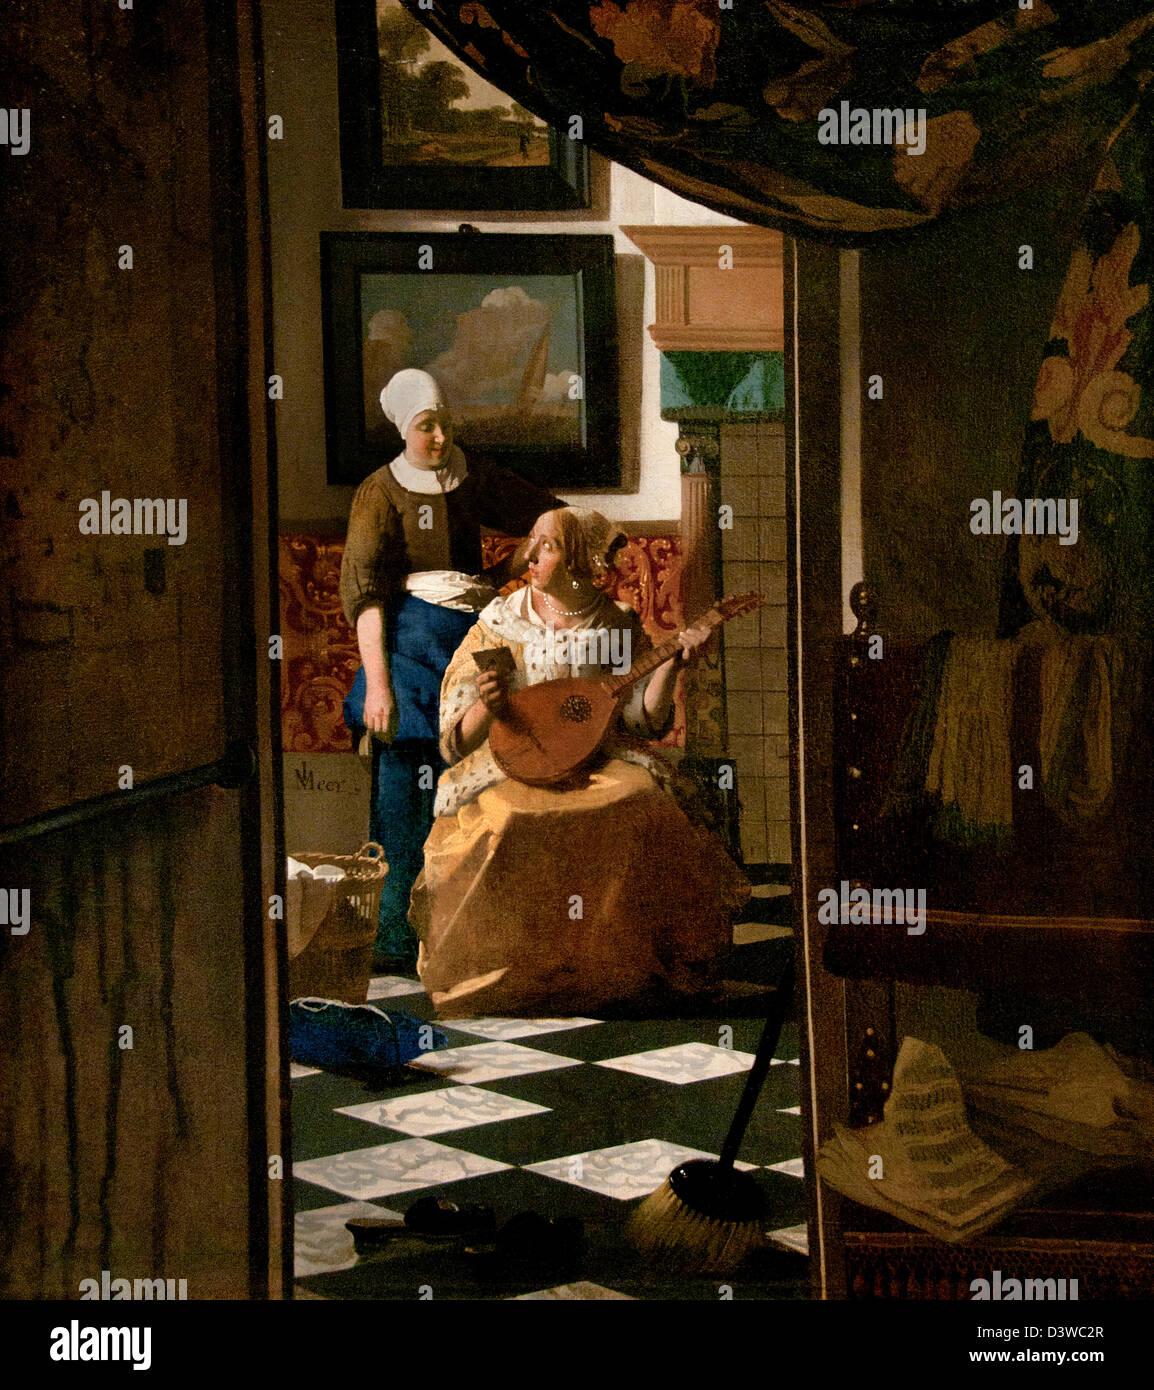 The love Letter 1669 Johannes Vermeer or Jan Vermeer 1632 - 1675 Dutch Netherlands - Stock Image